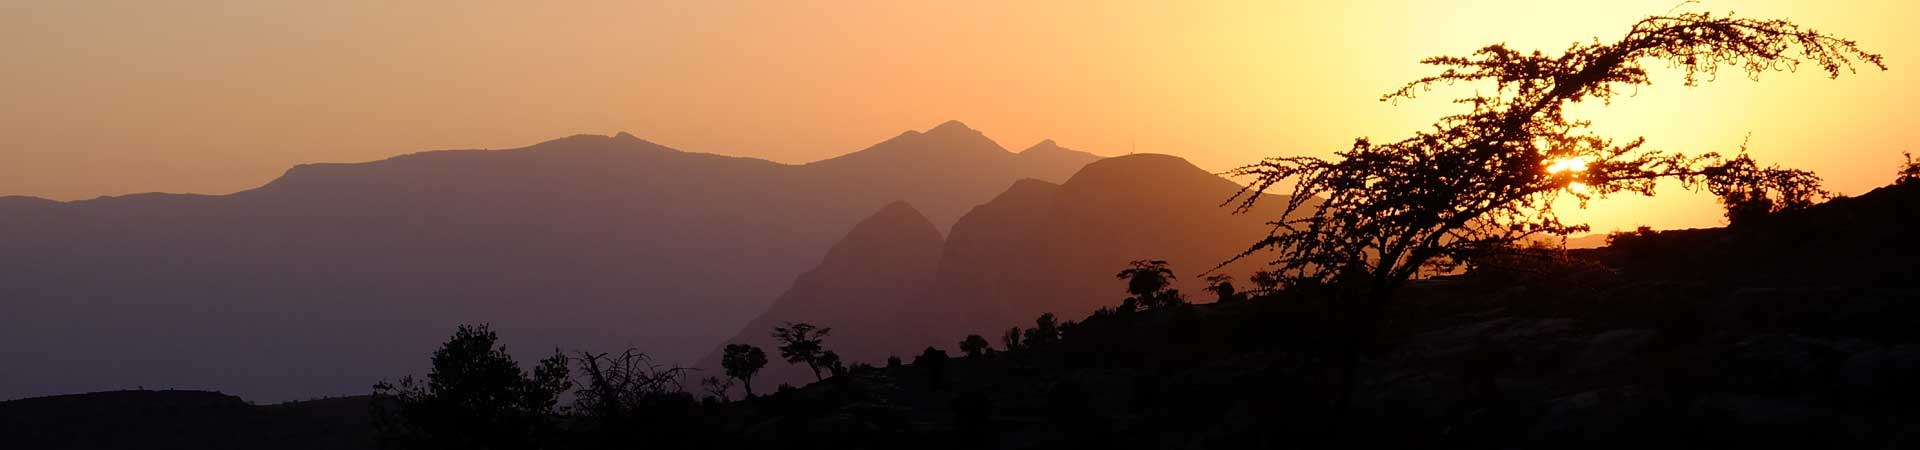 Abendstimmung auf dem Djabal Shams im Oman